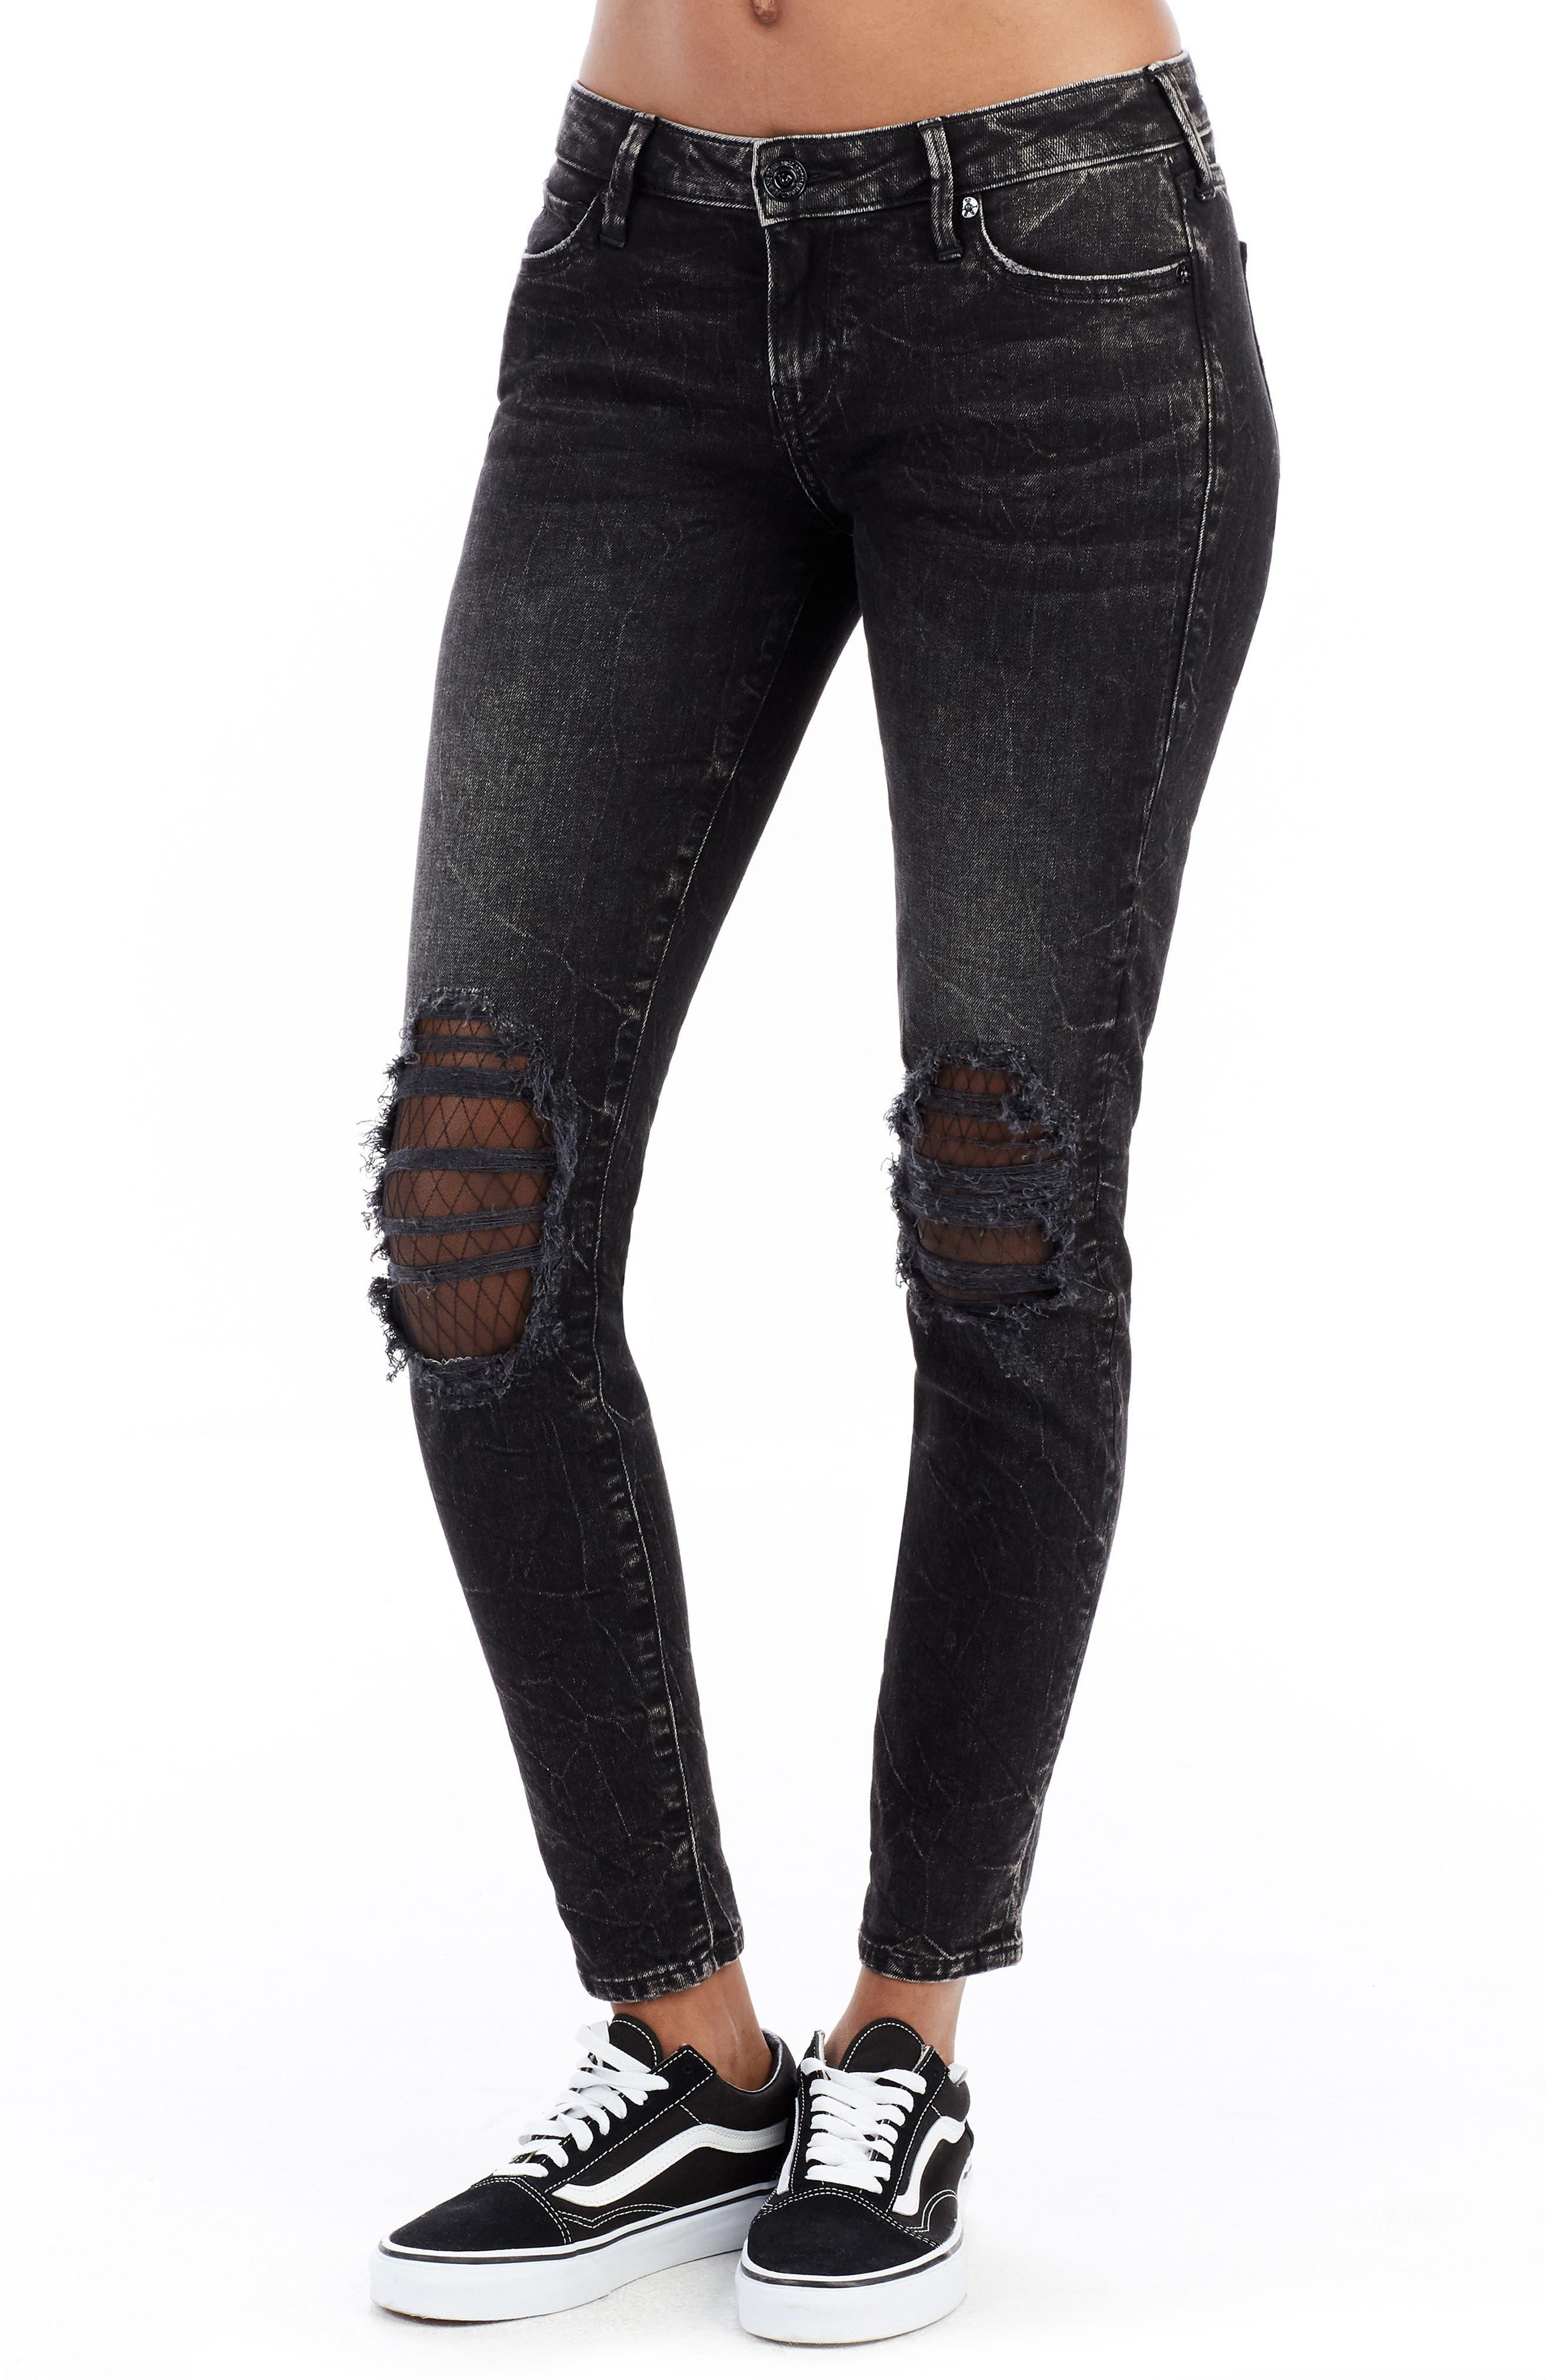 Main Image - True Religion Brand Jeans Halle Ankle Skinny Jeans (Raven Fever)